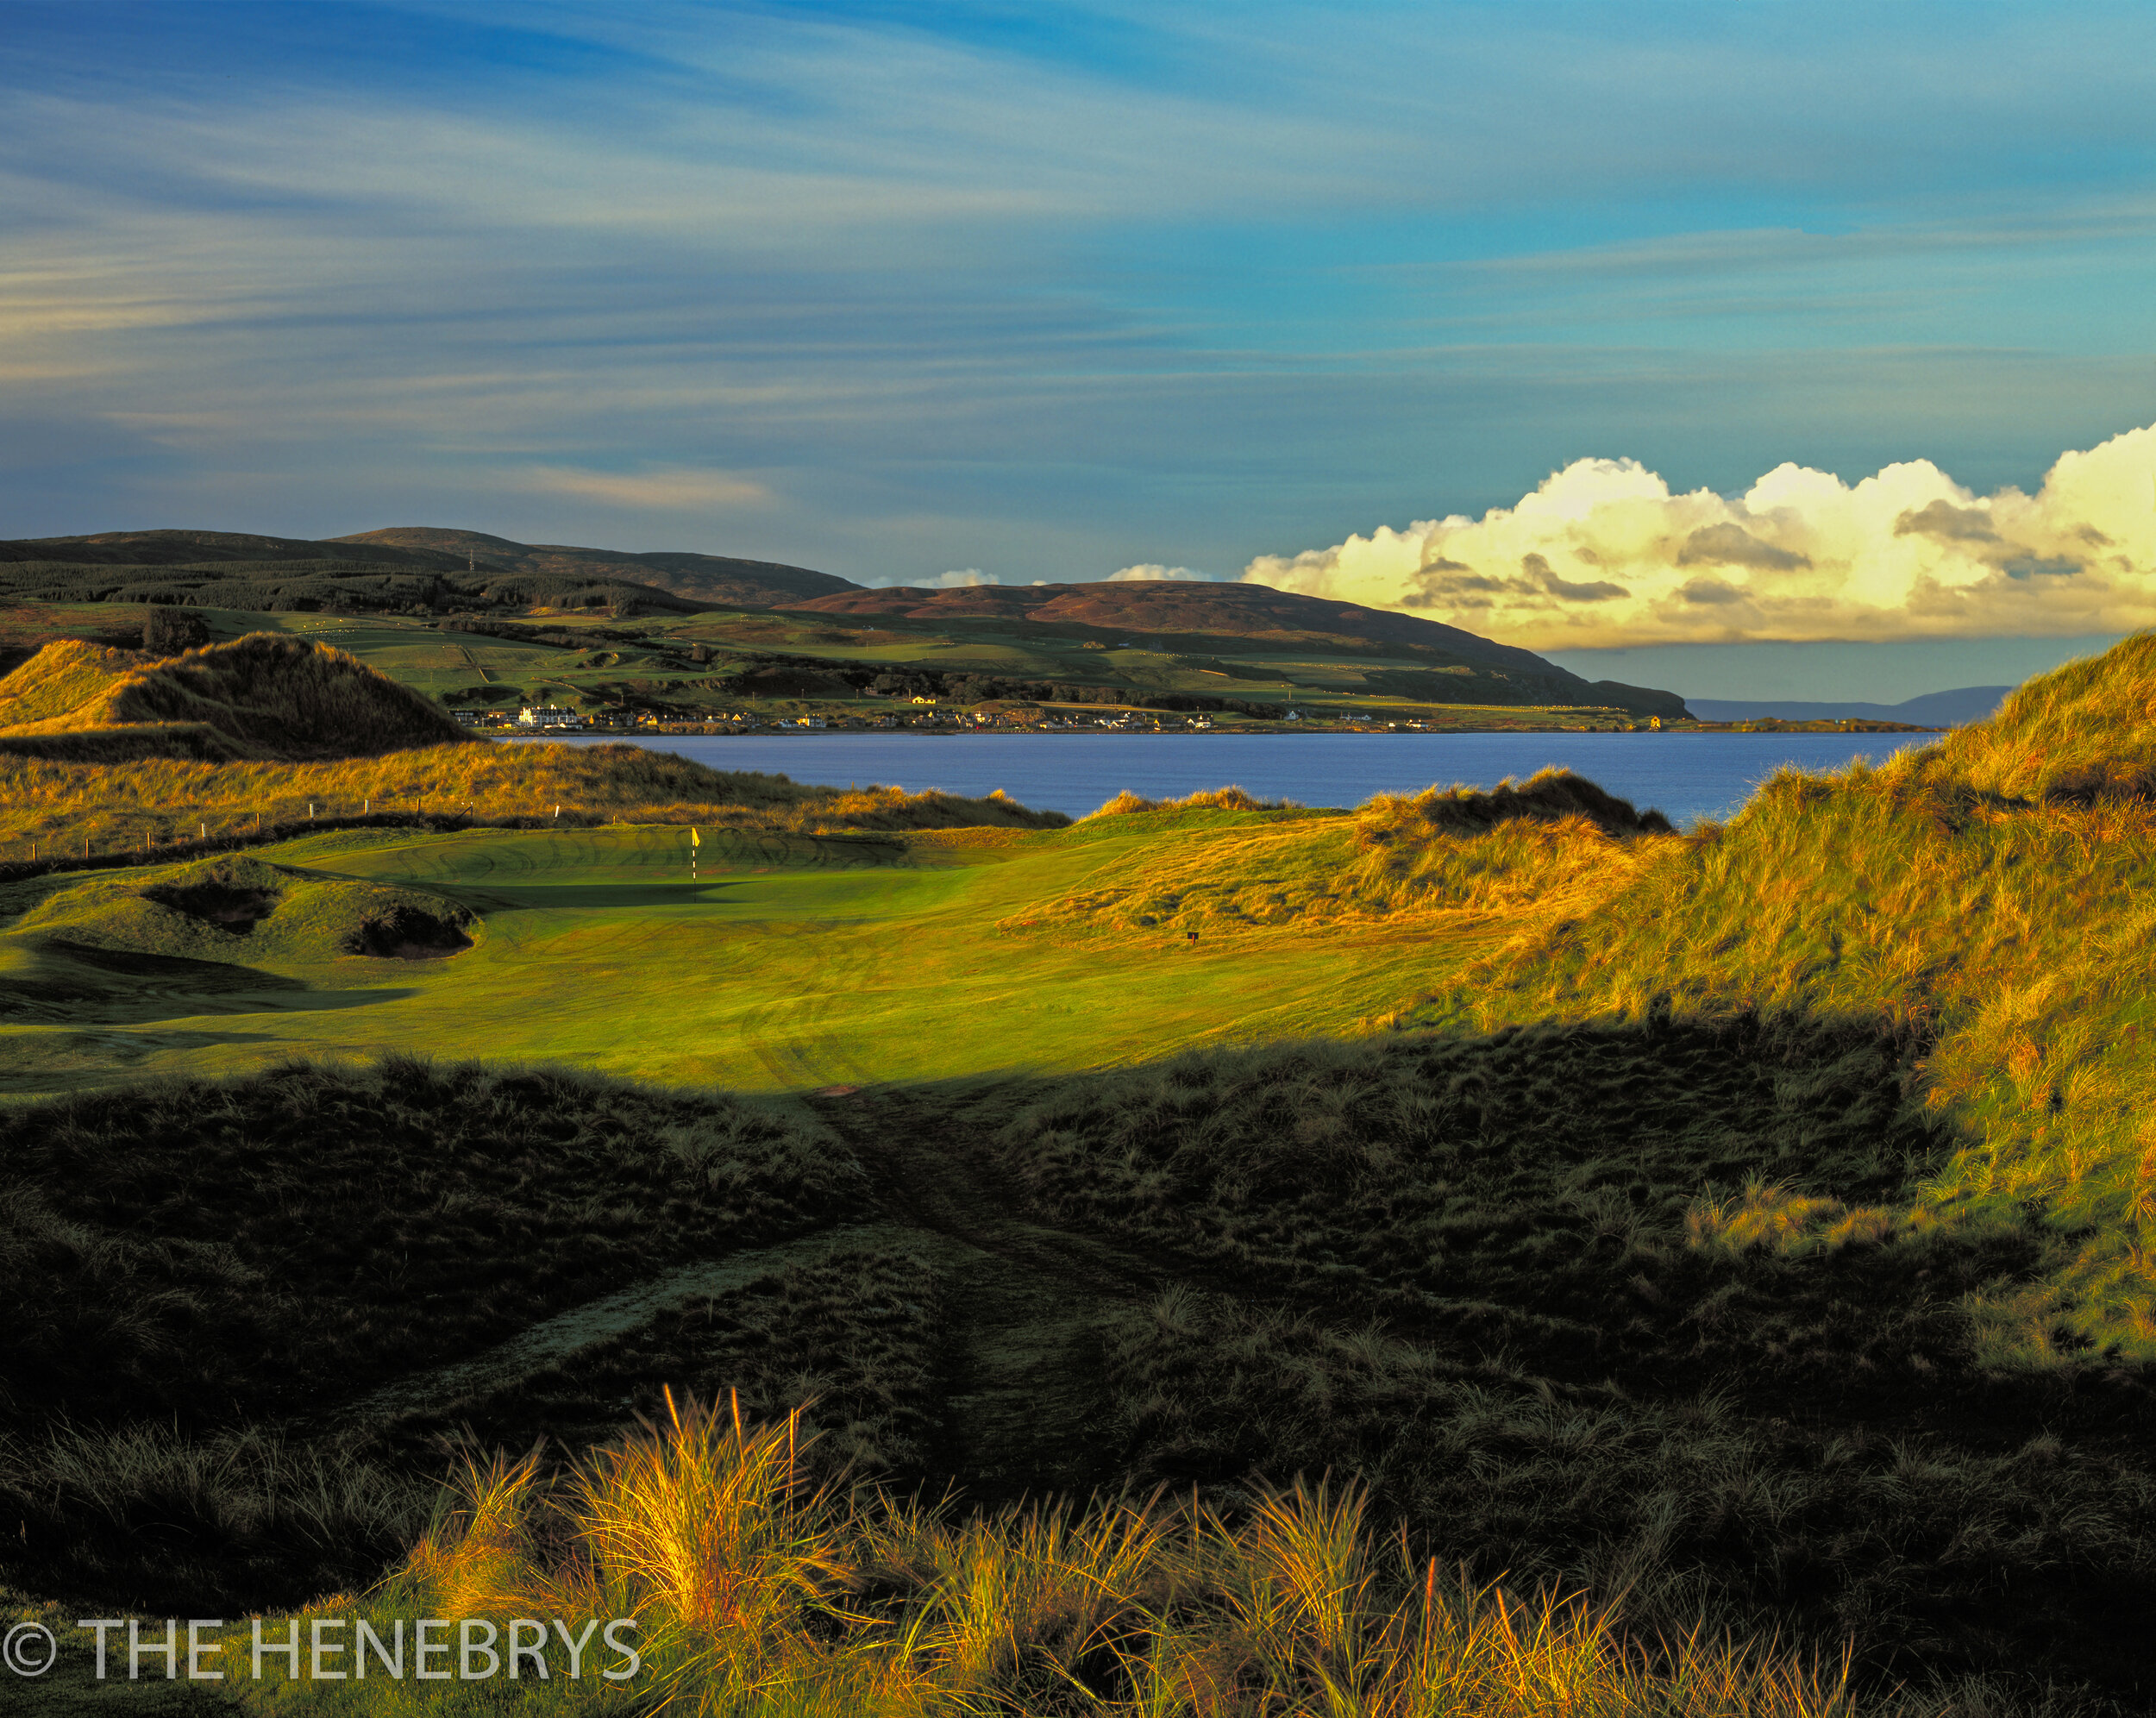 Machrihanish Dunes Golf Club #05, Campbeltown, Scotland